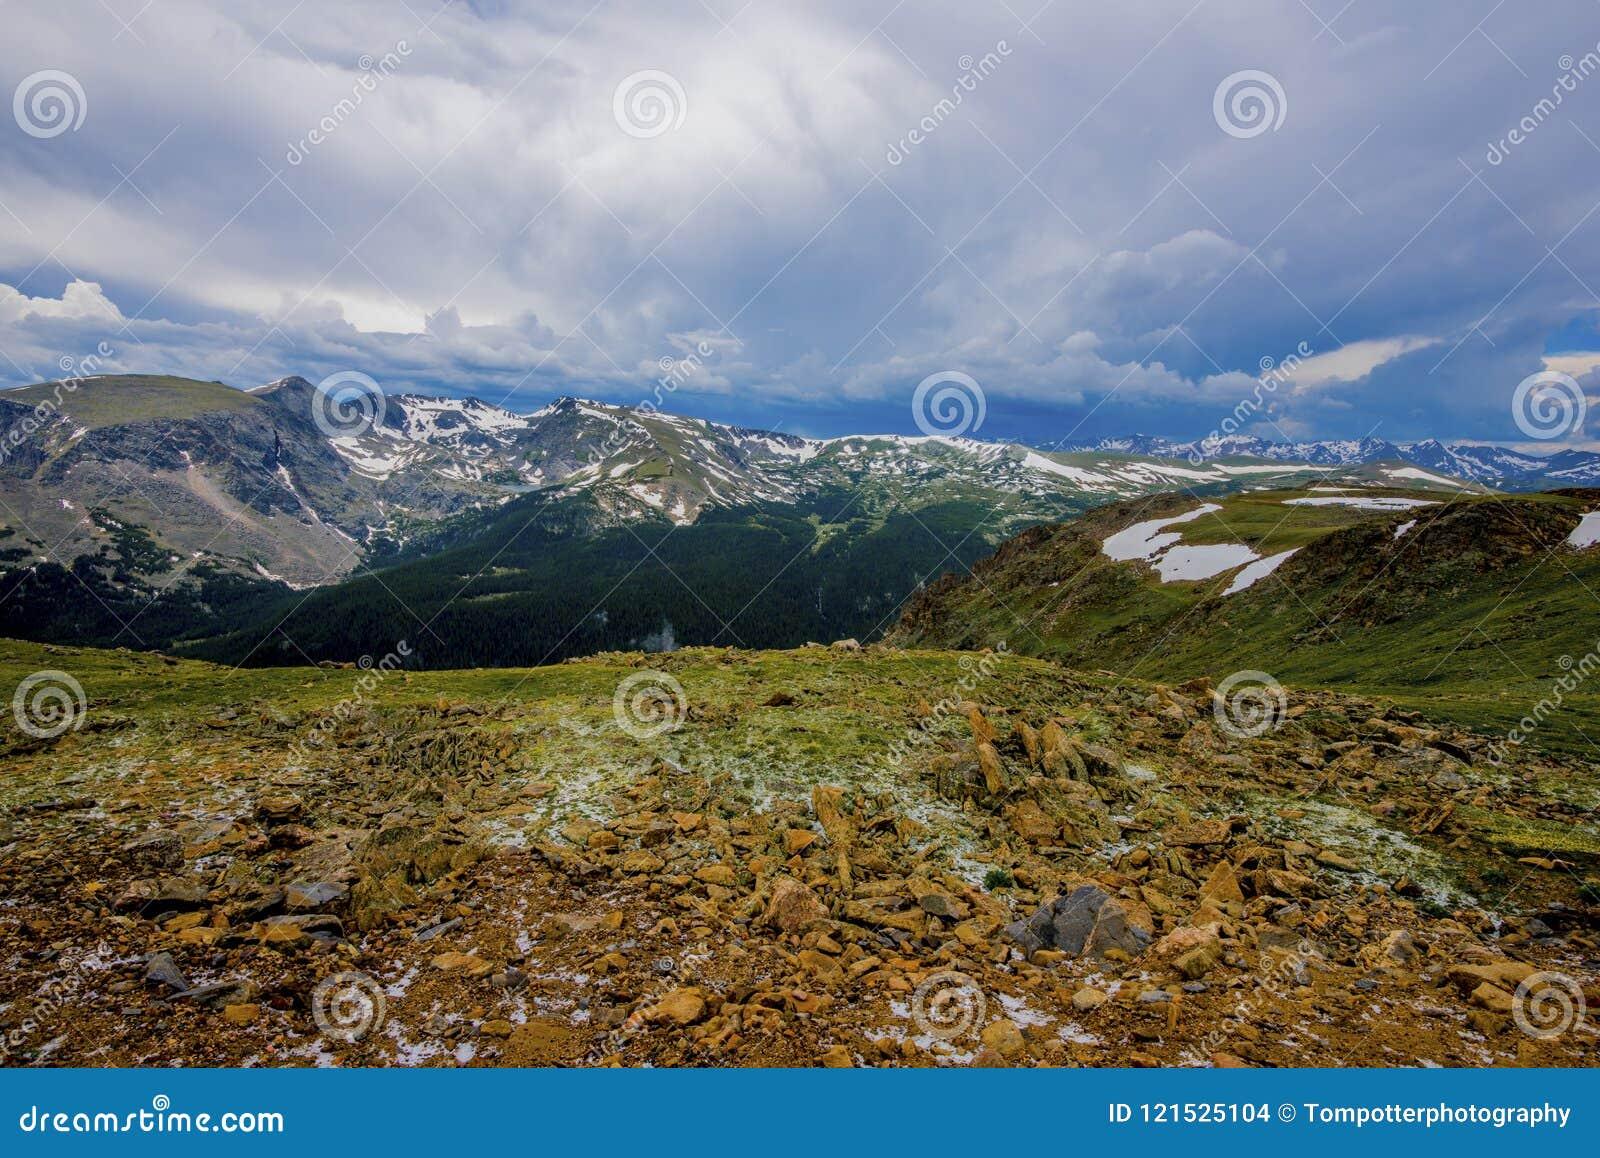 Rock Cut 2 Rocky Mountain National Park